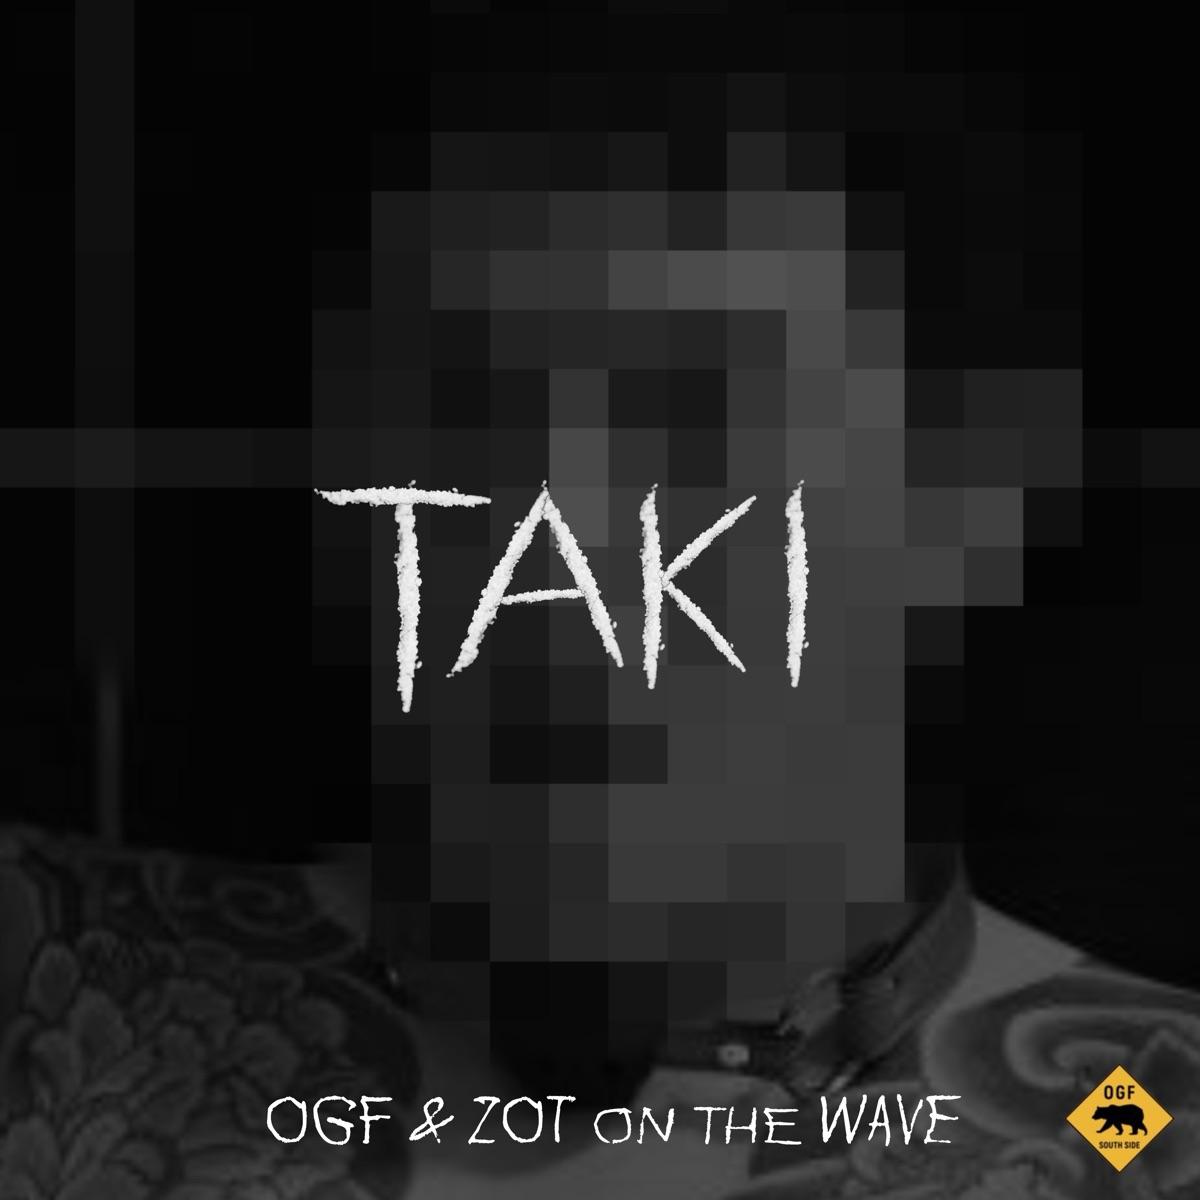 『OGF & ZOT on the WAVE - TAKI』収録の『TAKI』ジャケット